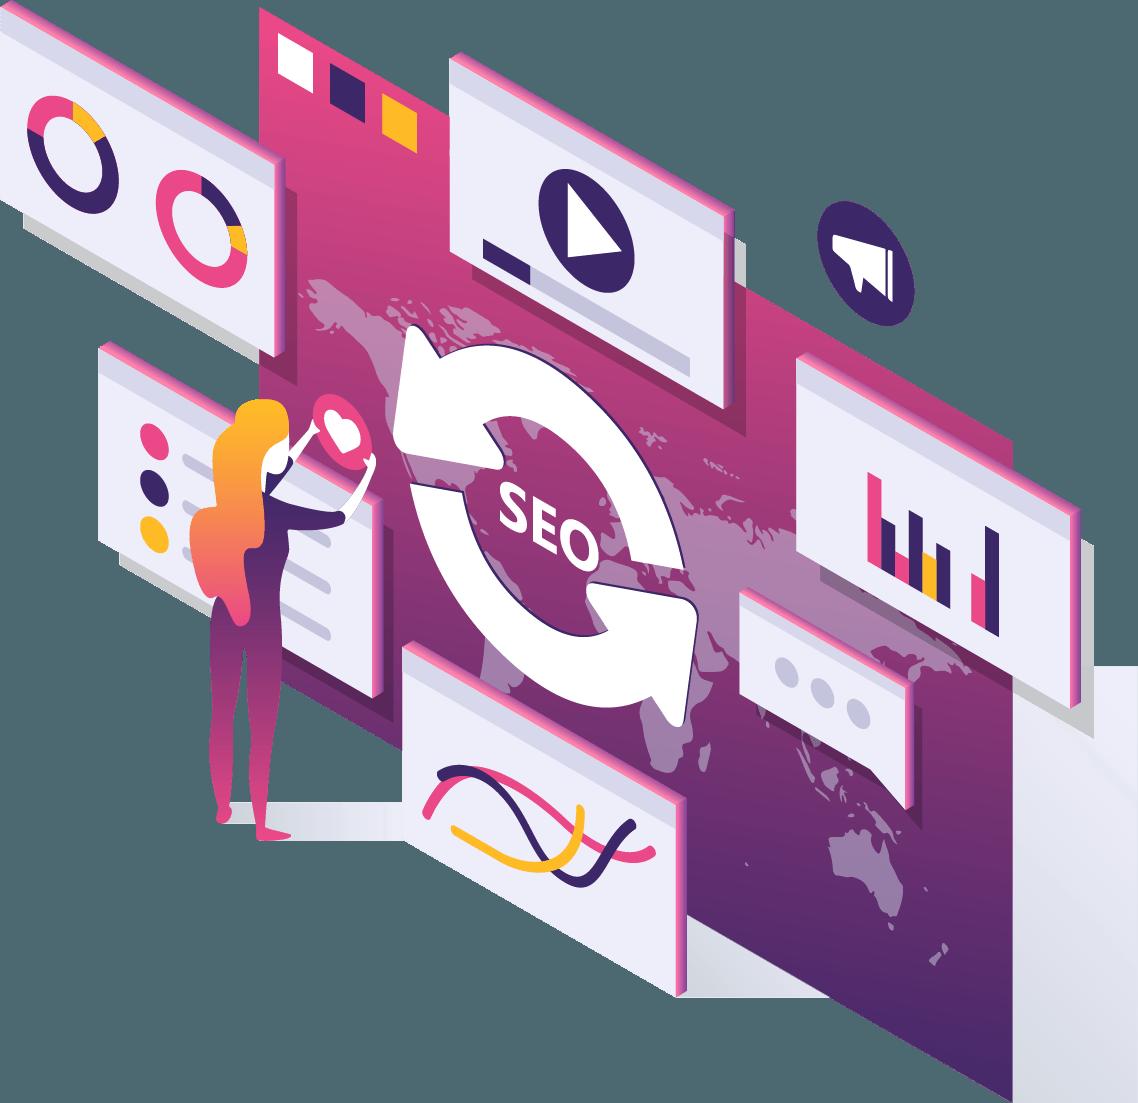 Best SEO Company Australia| Best SEO Services Sydney